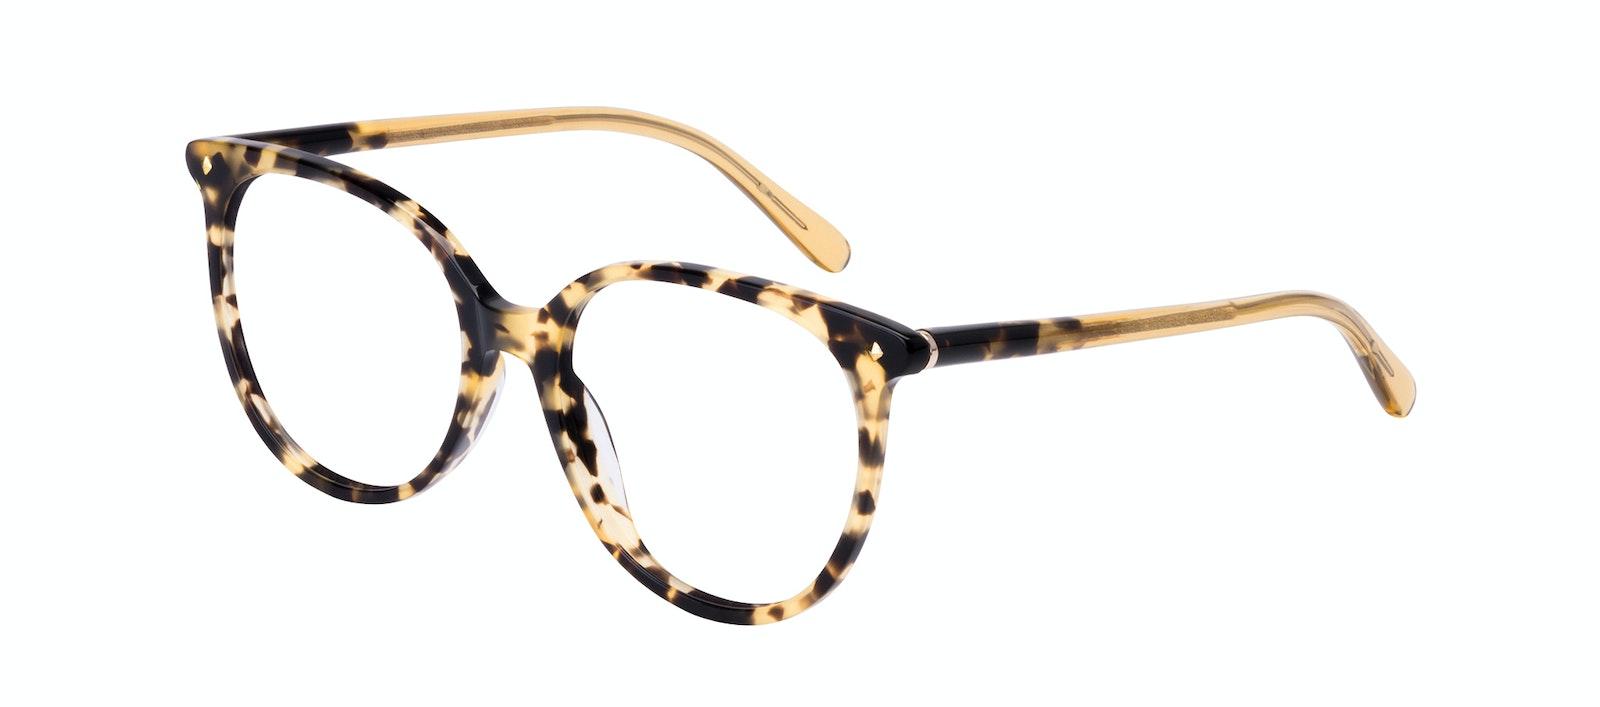 Affordable Fashion Glasses Round Eyeglasses Women Area Petite Bingal Tilt